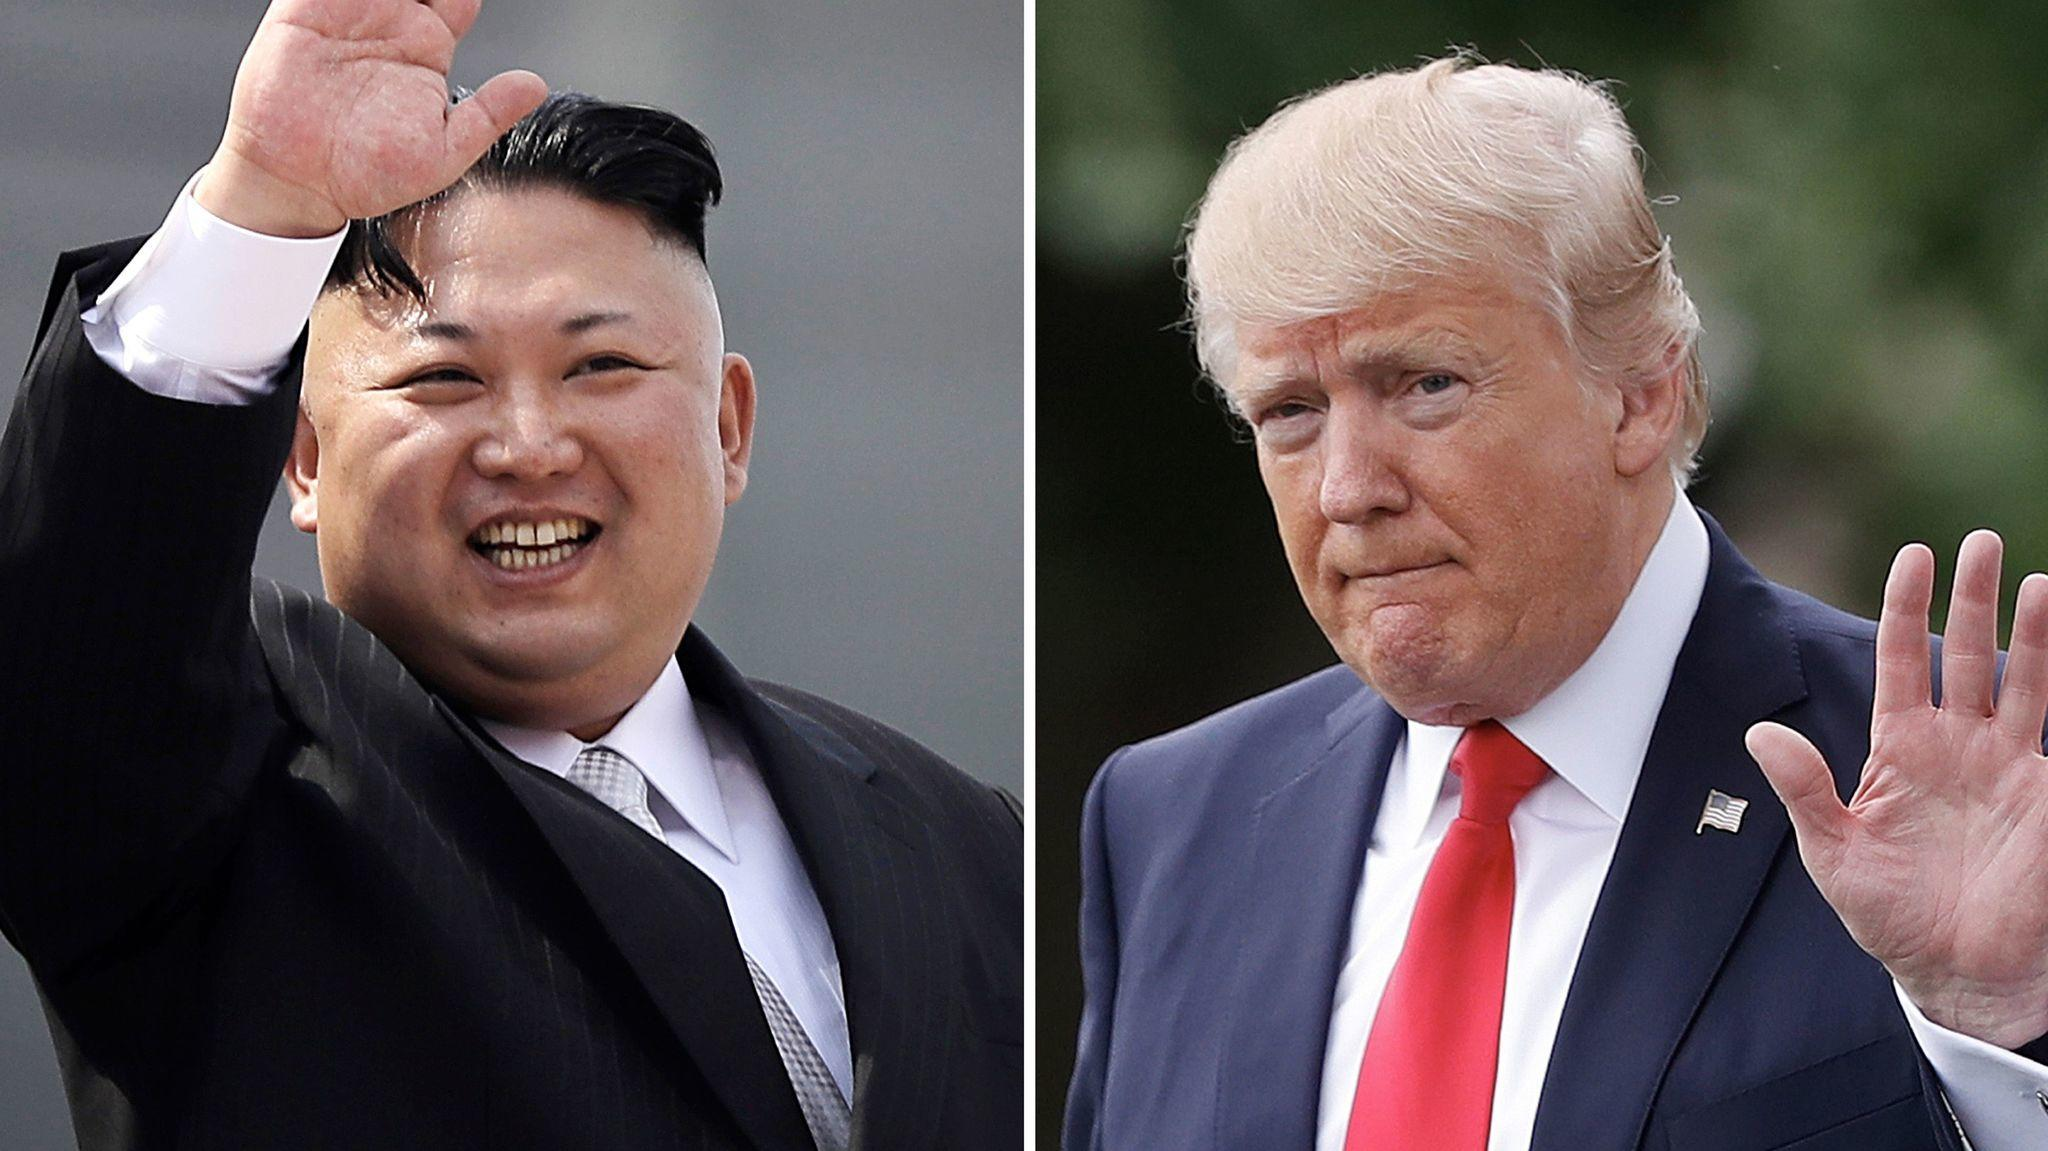 Kim Jong Un and President Trump (Wong Maye-E, Pablo Martinez Monsivais / Associated Press)